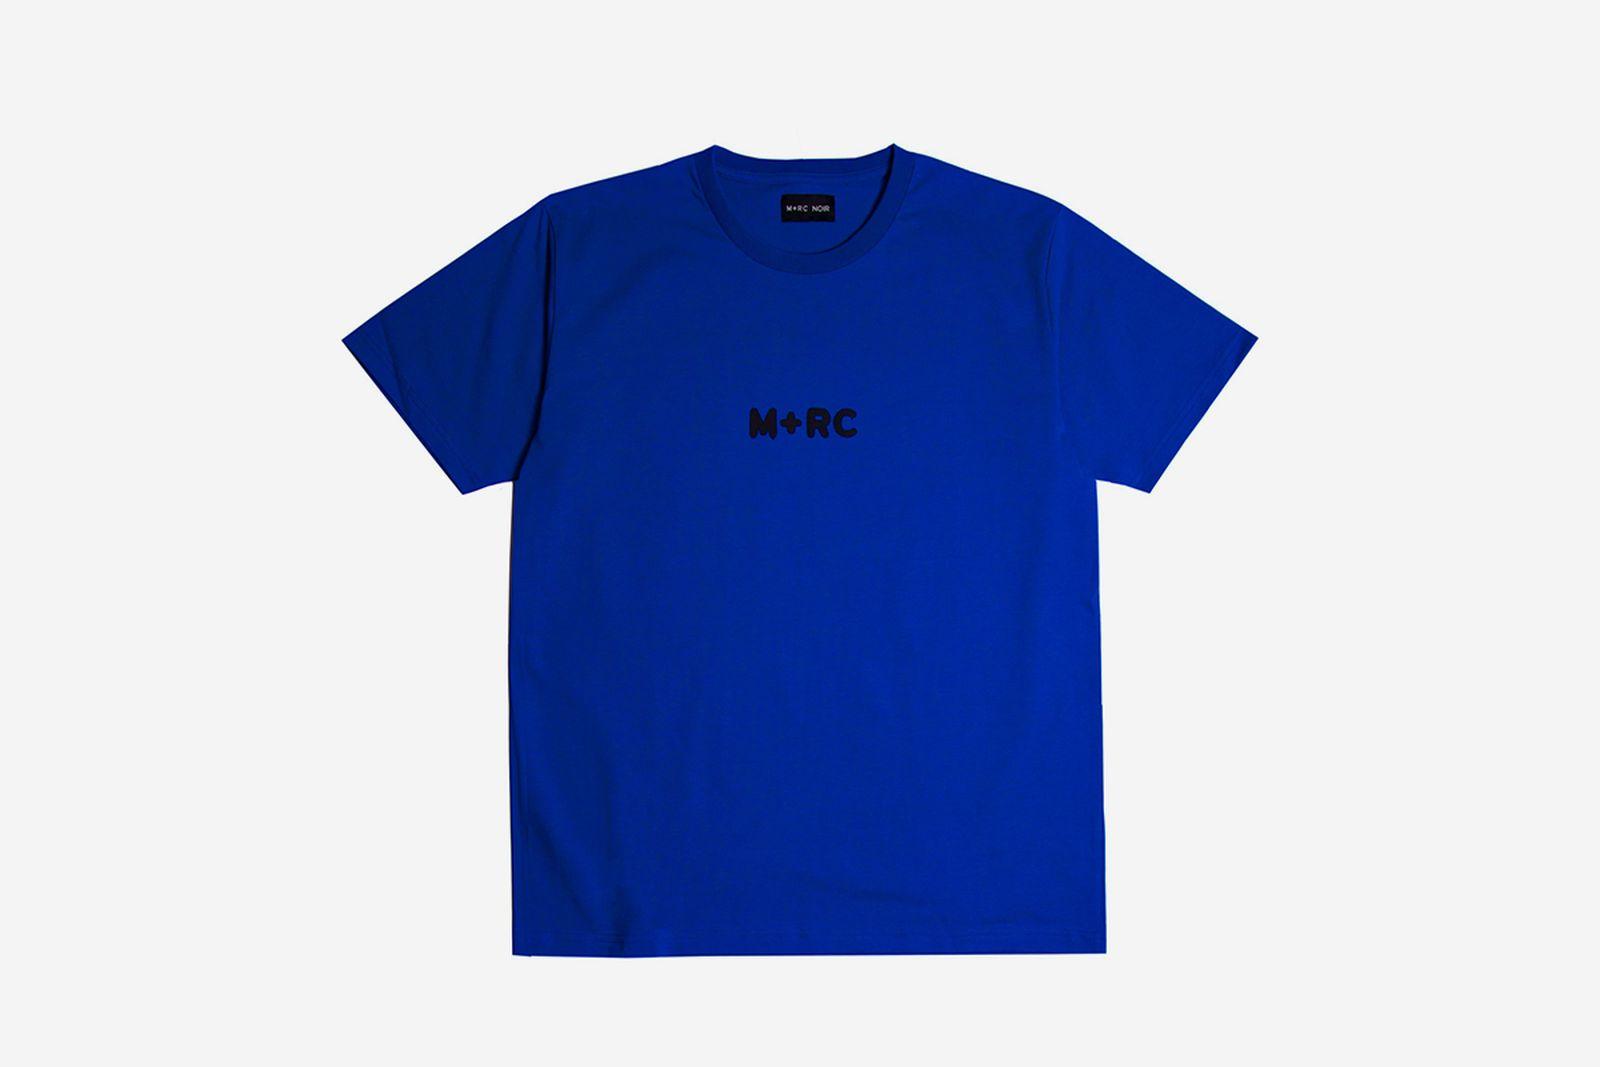 tee shirt BIG M blue front M RC 2048x2048 M+RC NOIR SS18 playboi carti